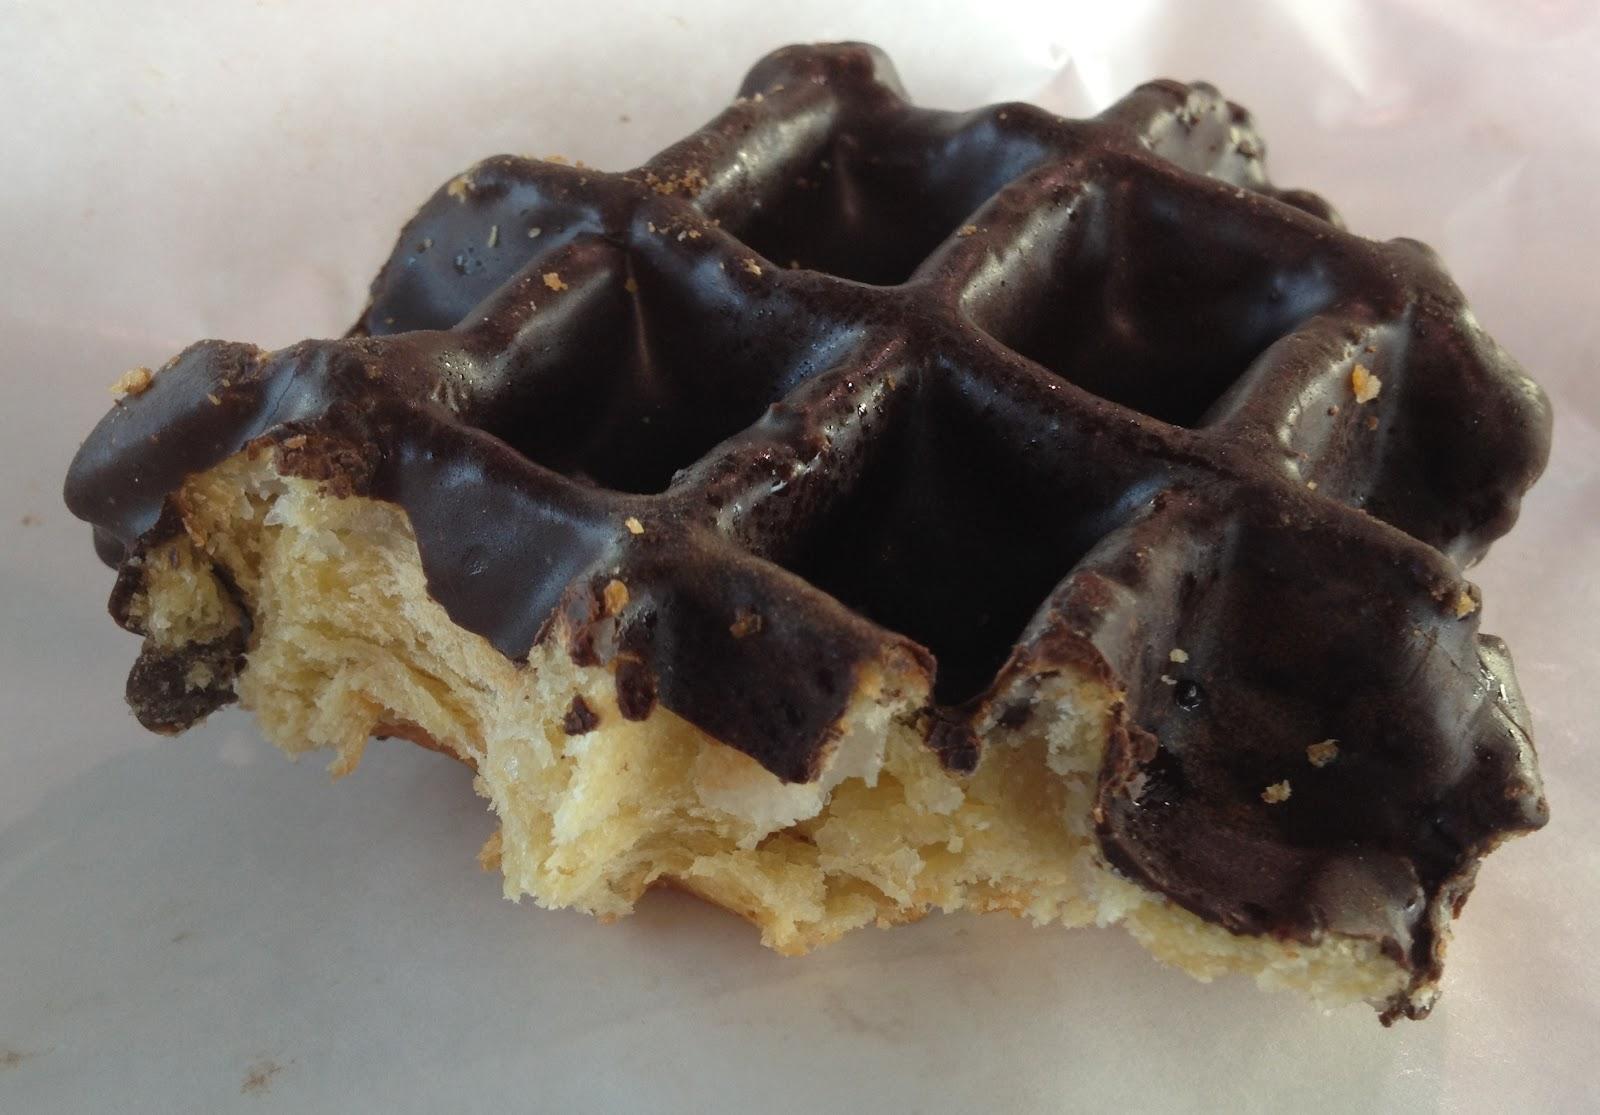 eating amp chocolate covered belgian waffle